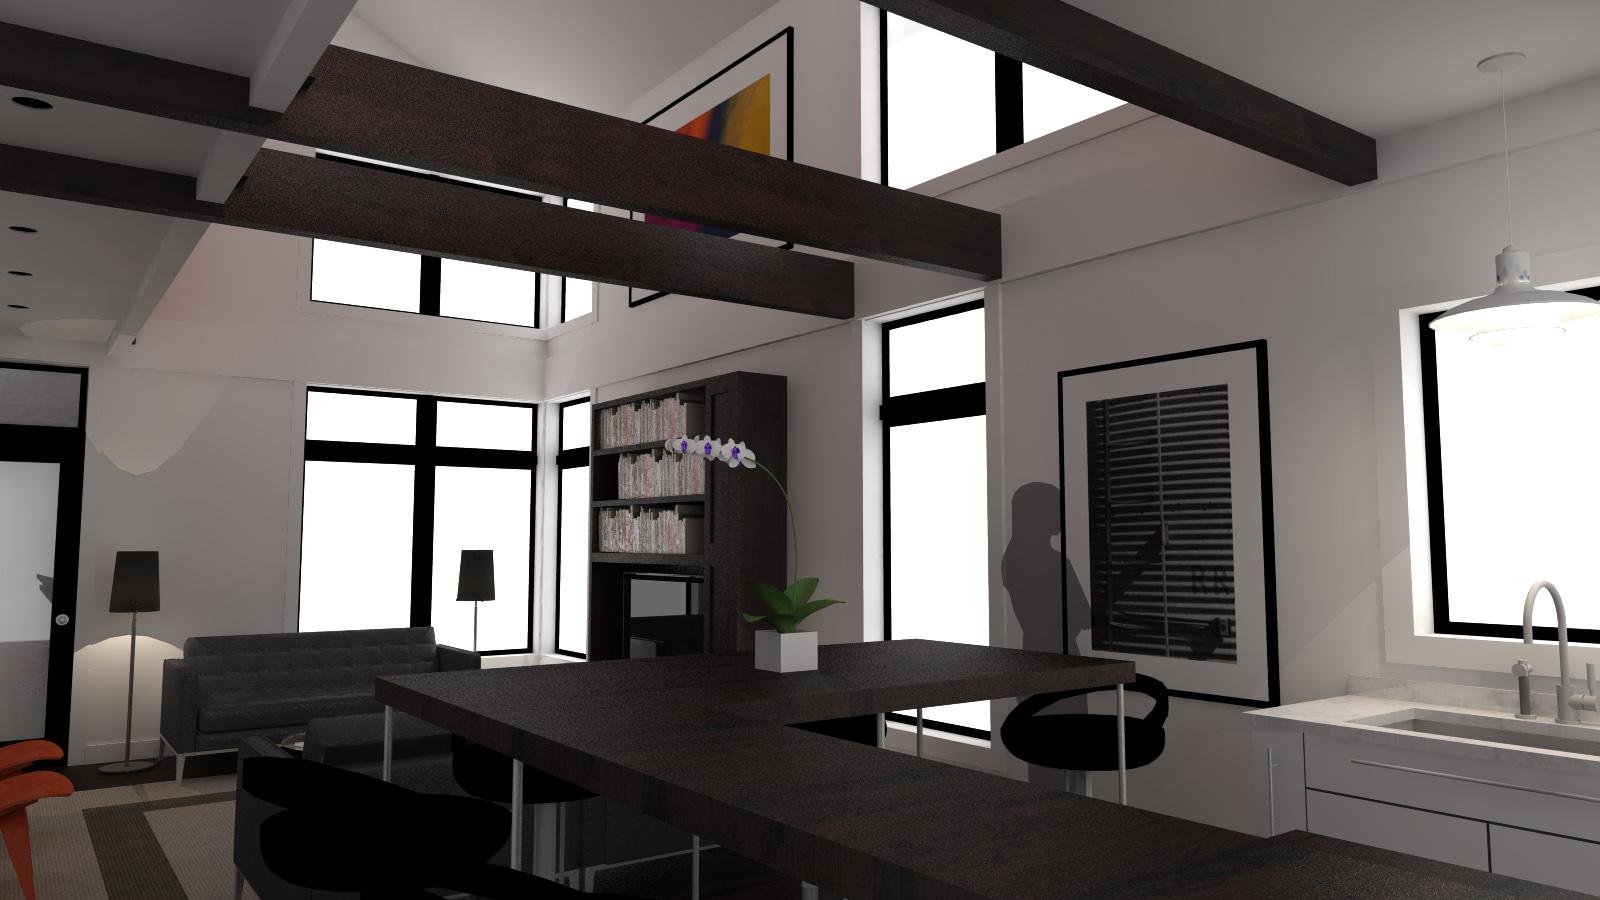 7_interiorview_3.jpg